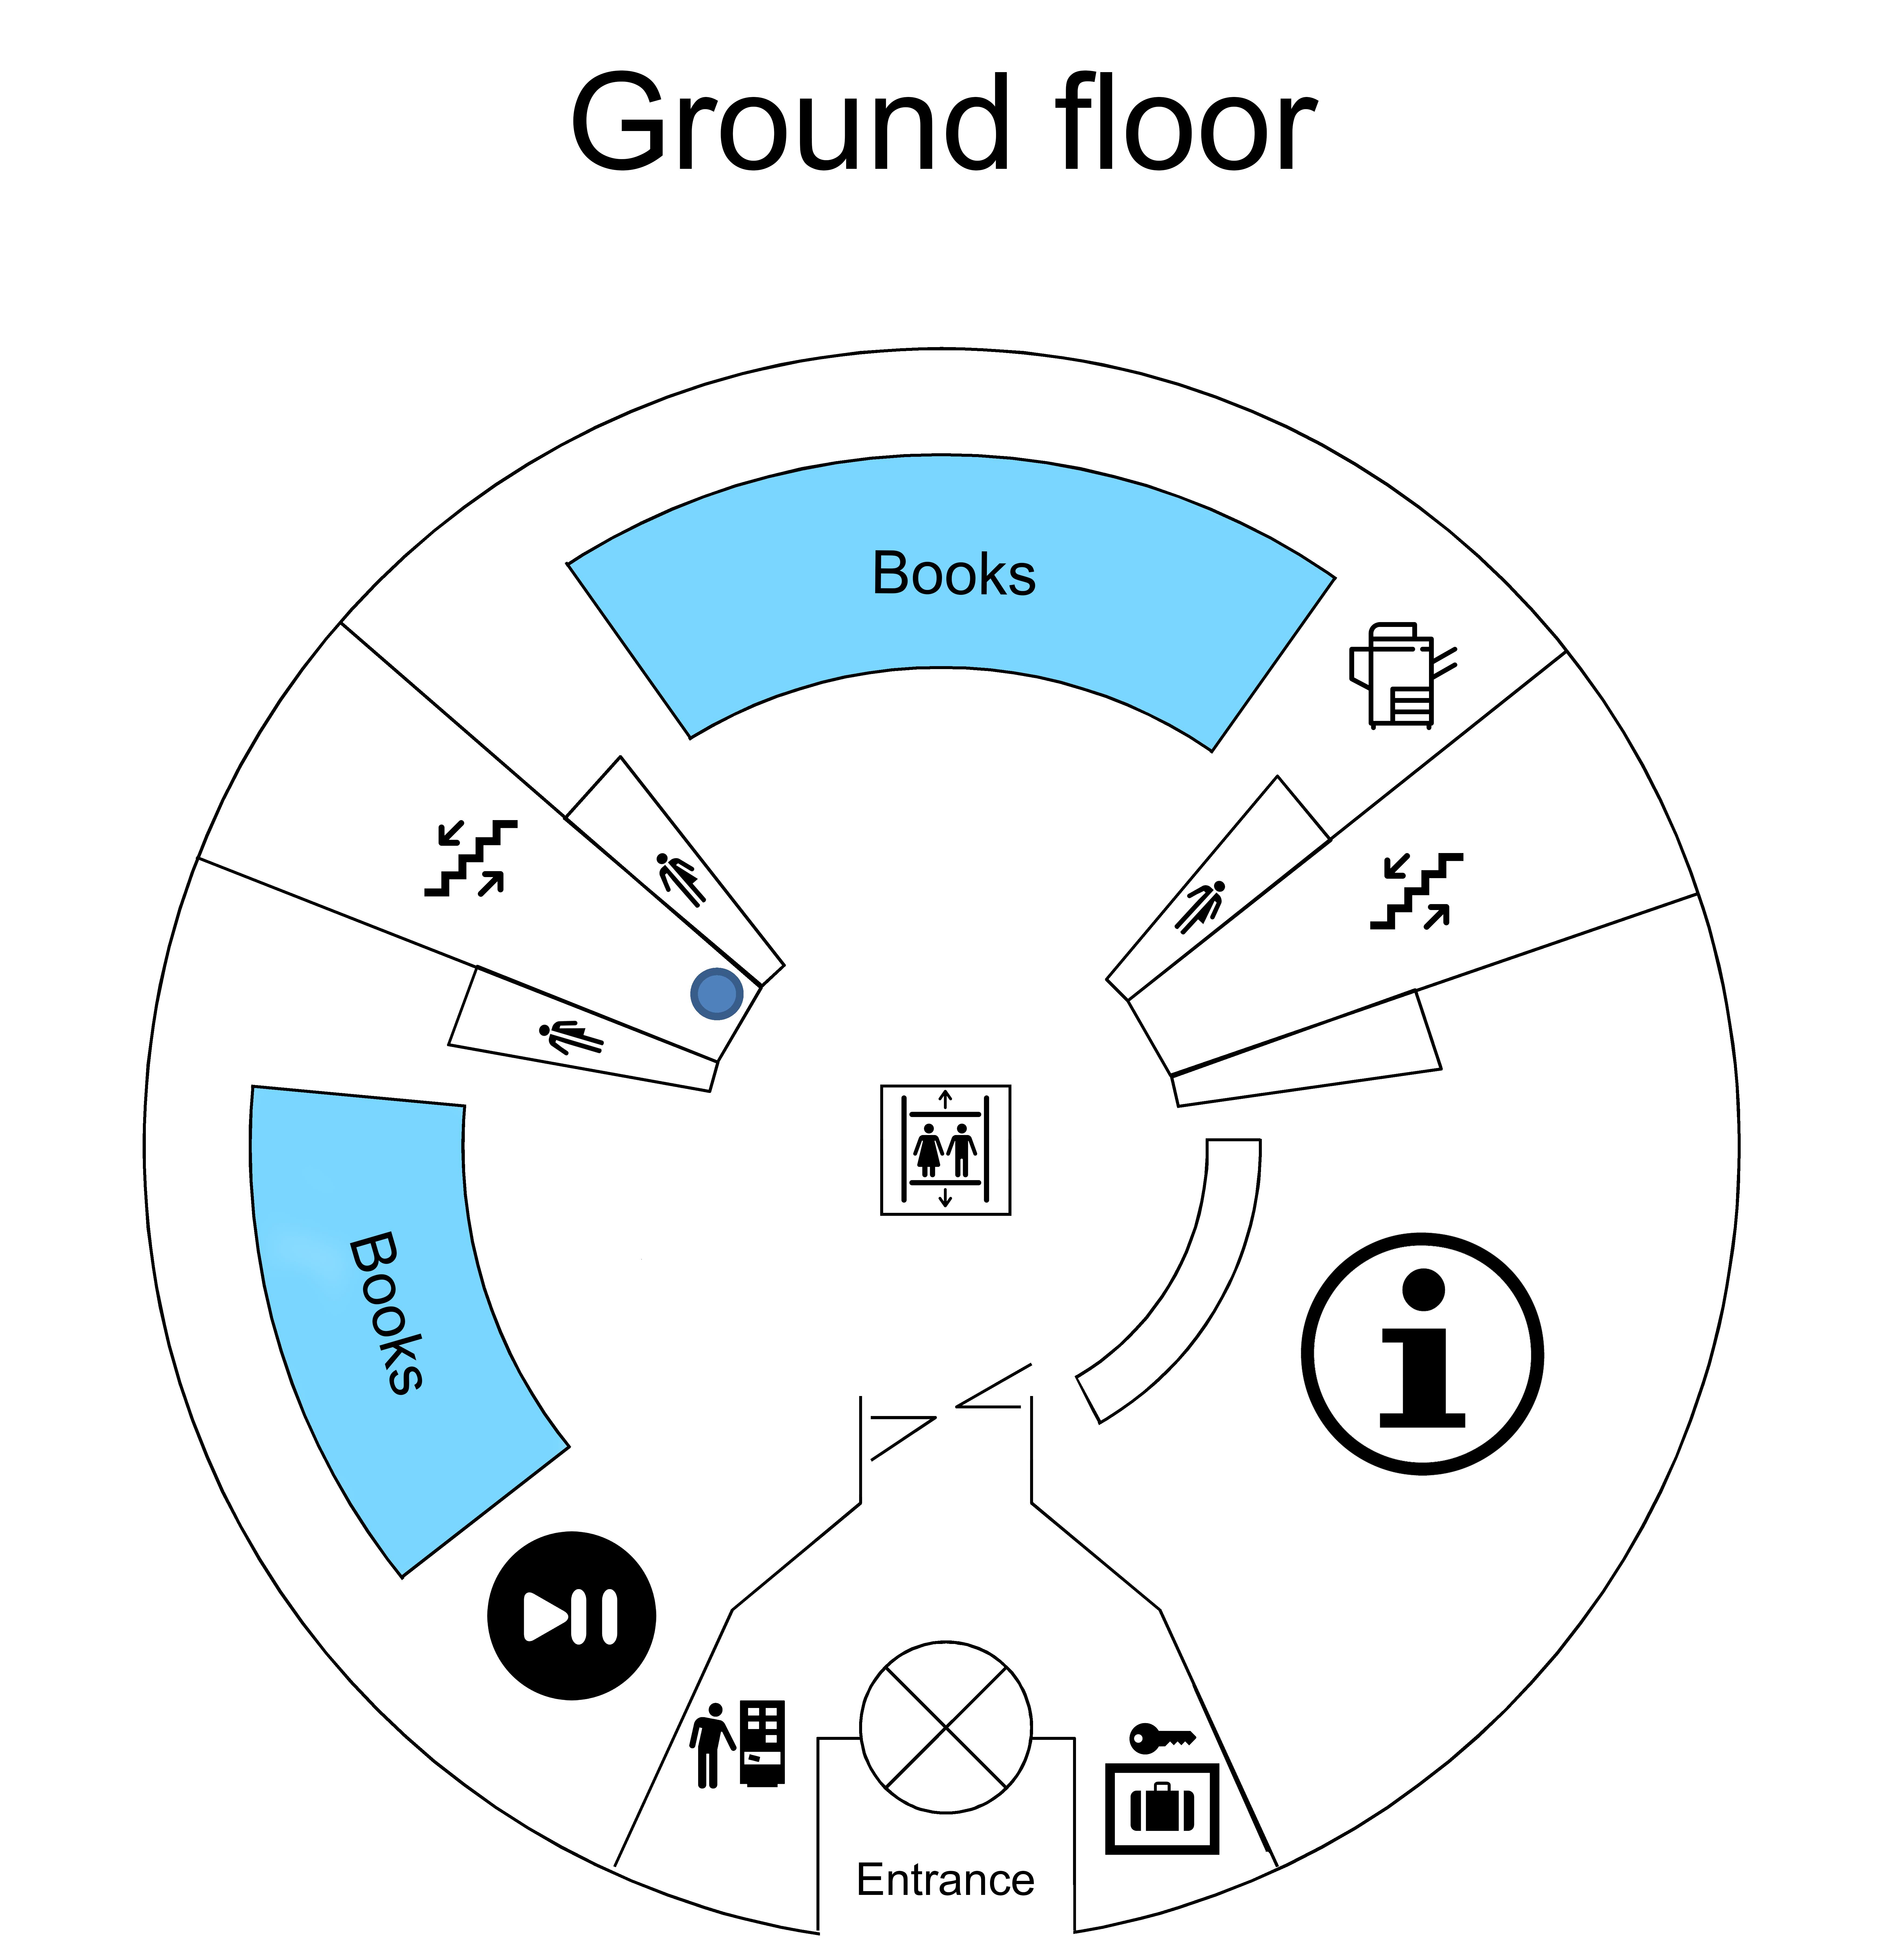 [IMAGE = Ground floor map]